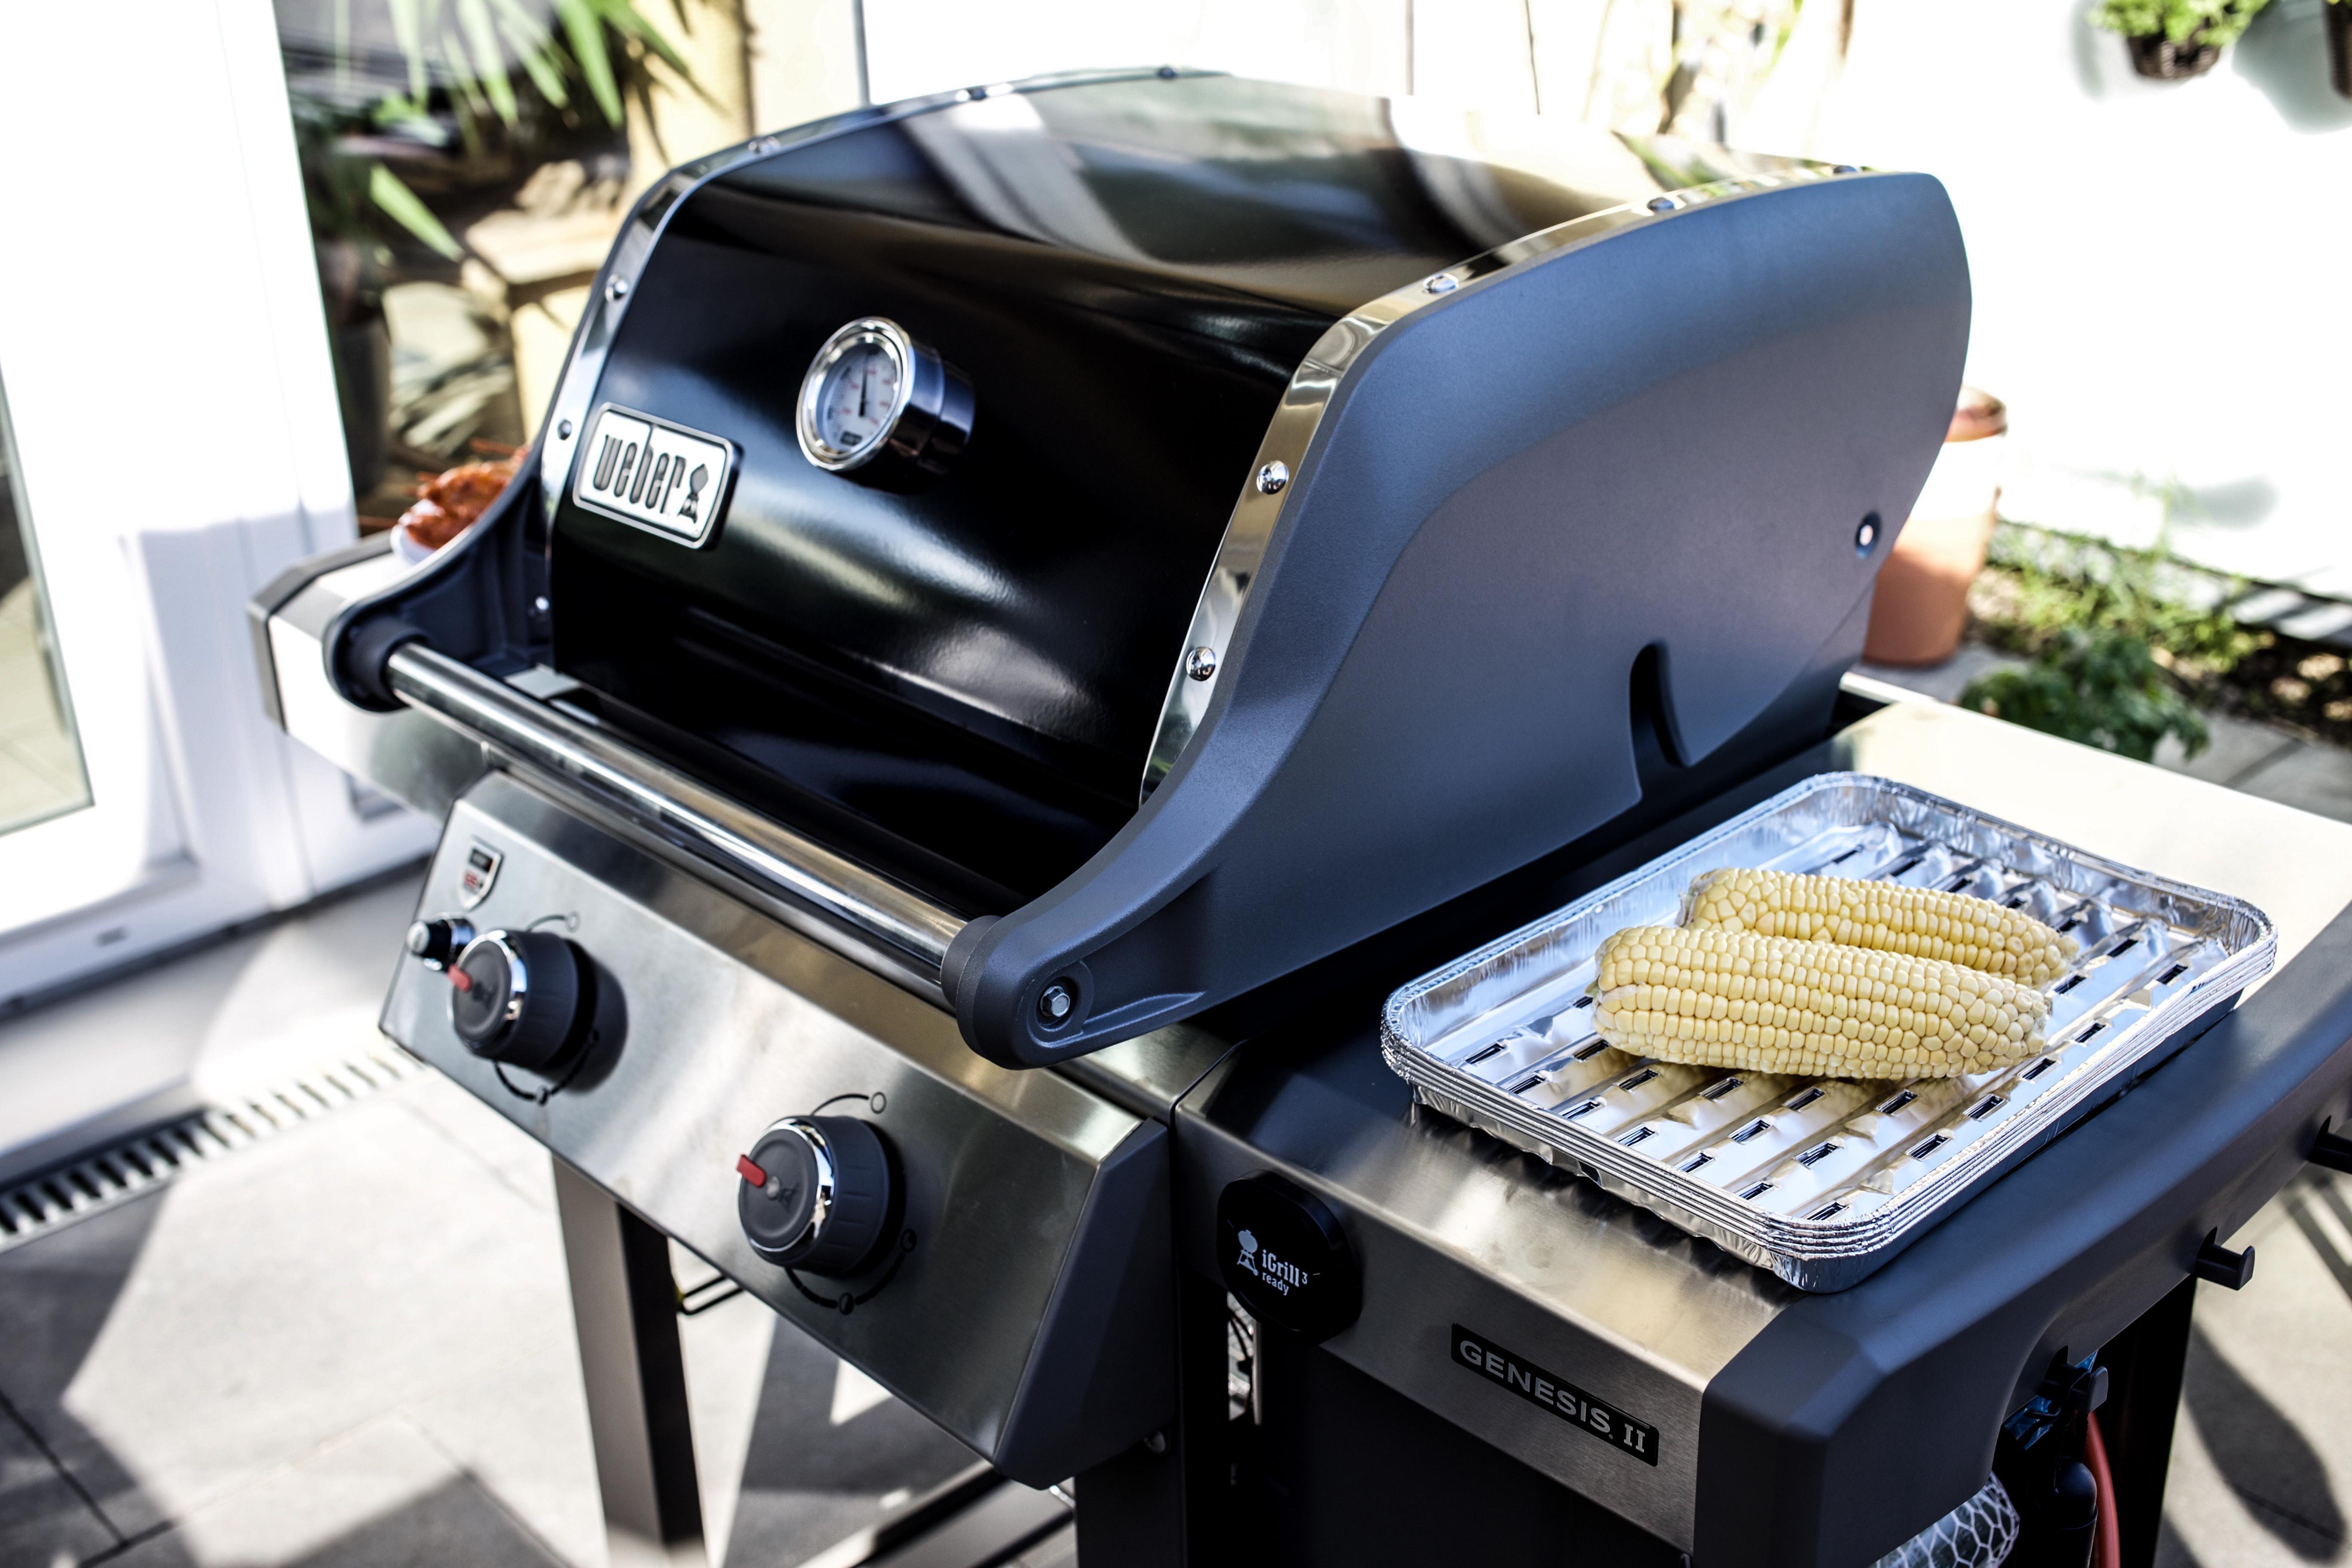 grill-abend-grillen-sommer-rezepte-ideen-tipps-weber-grill-genesis_0003